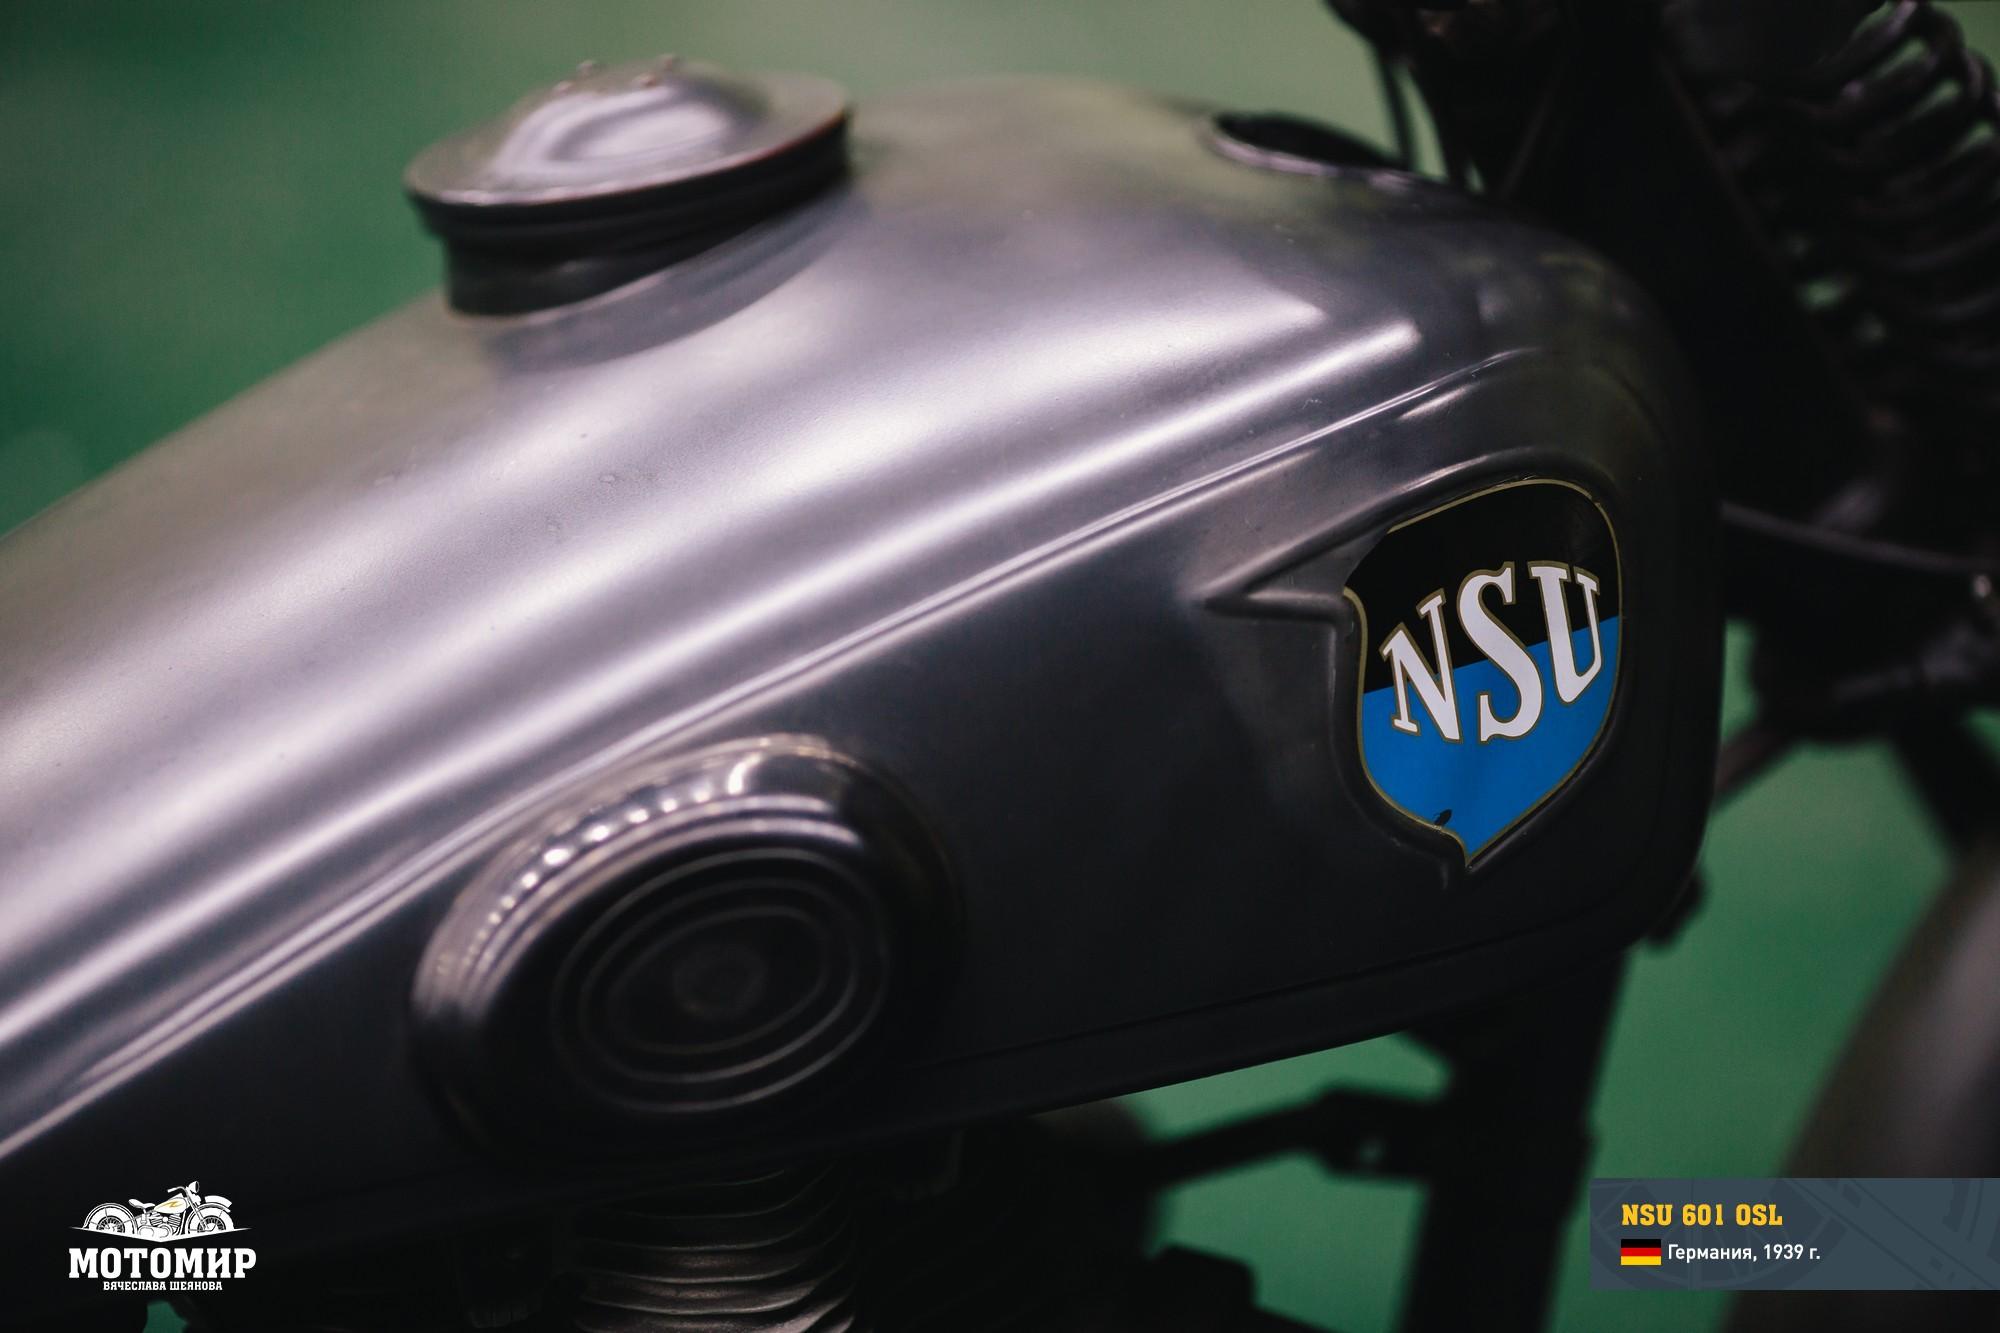 nsu-601-osl-201512-web-18